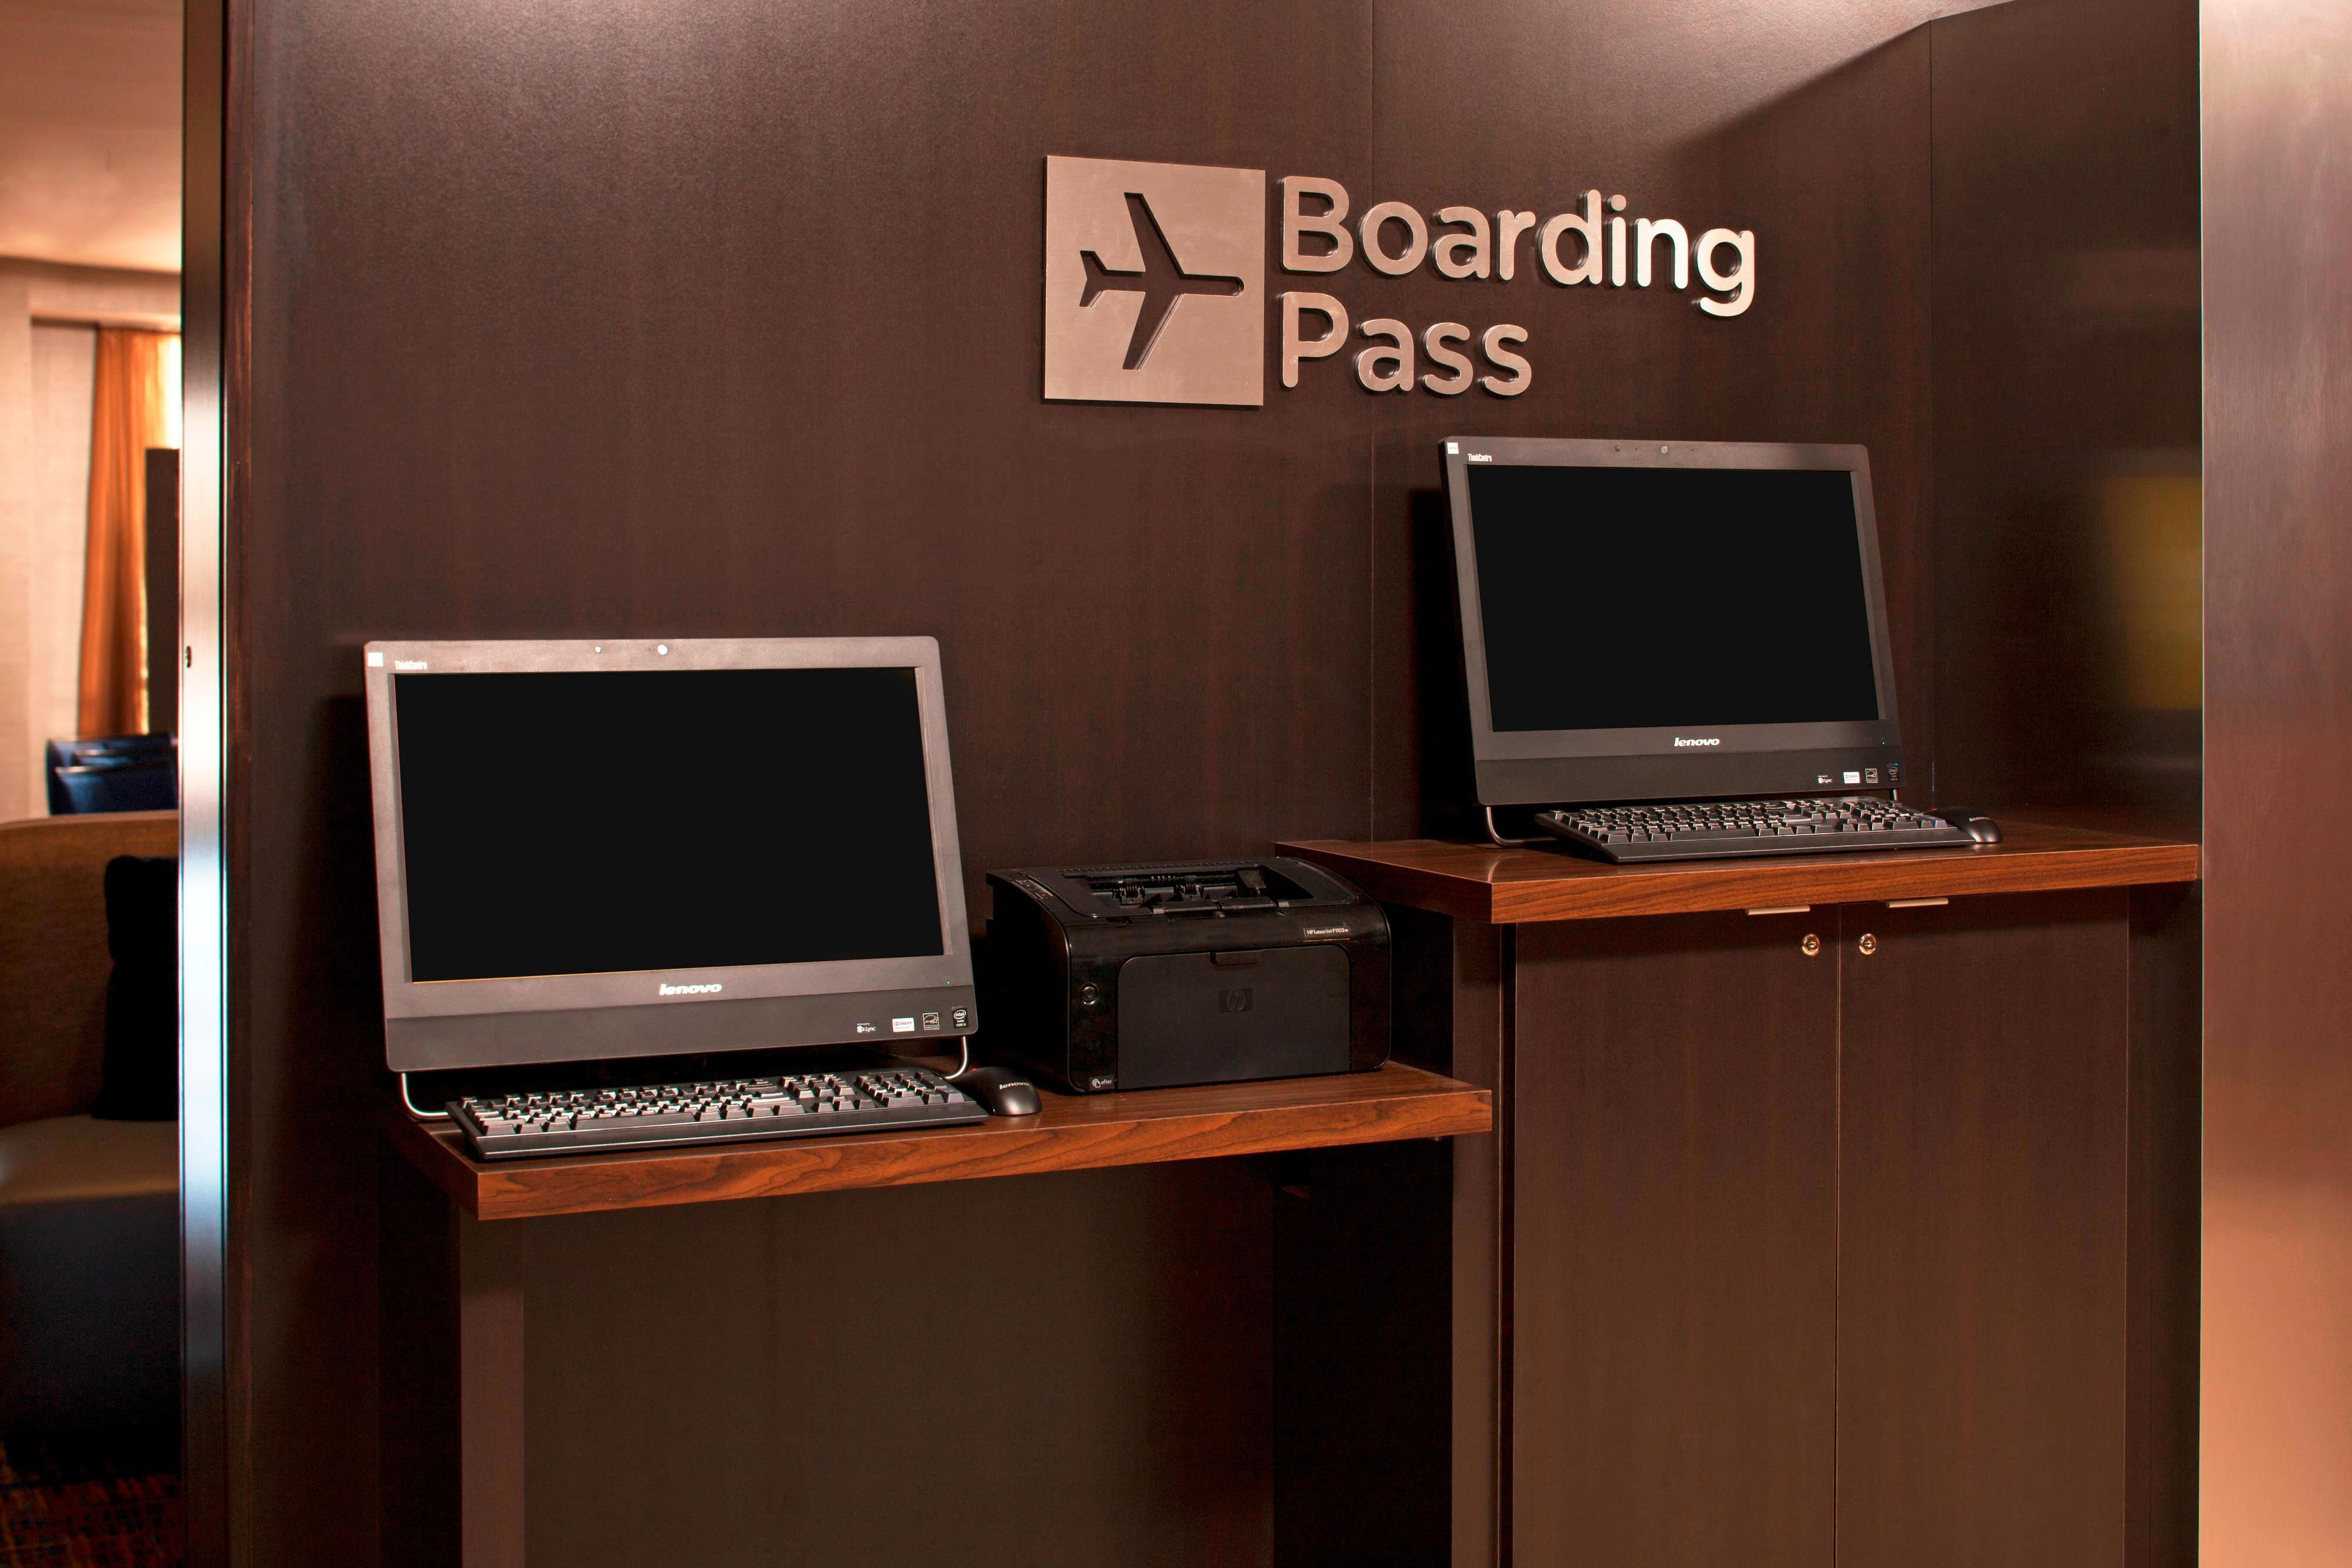 Farmington Hotel Boarding Pass Printing Station